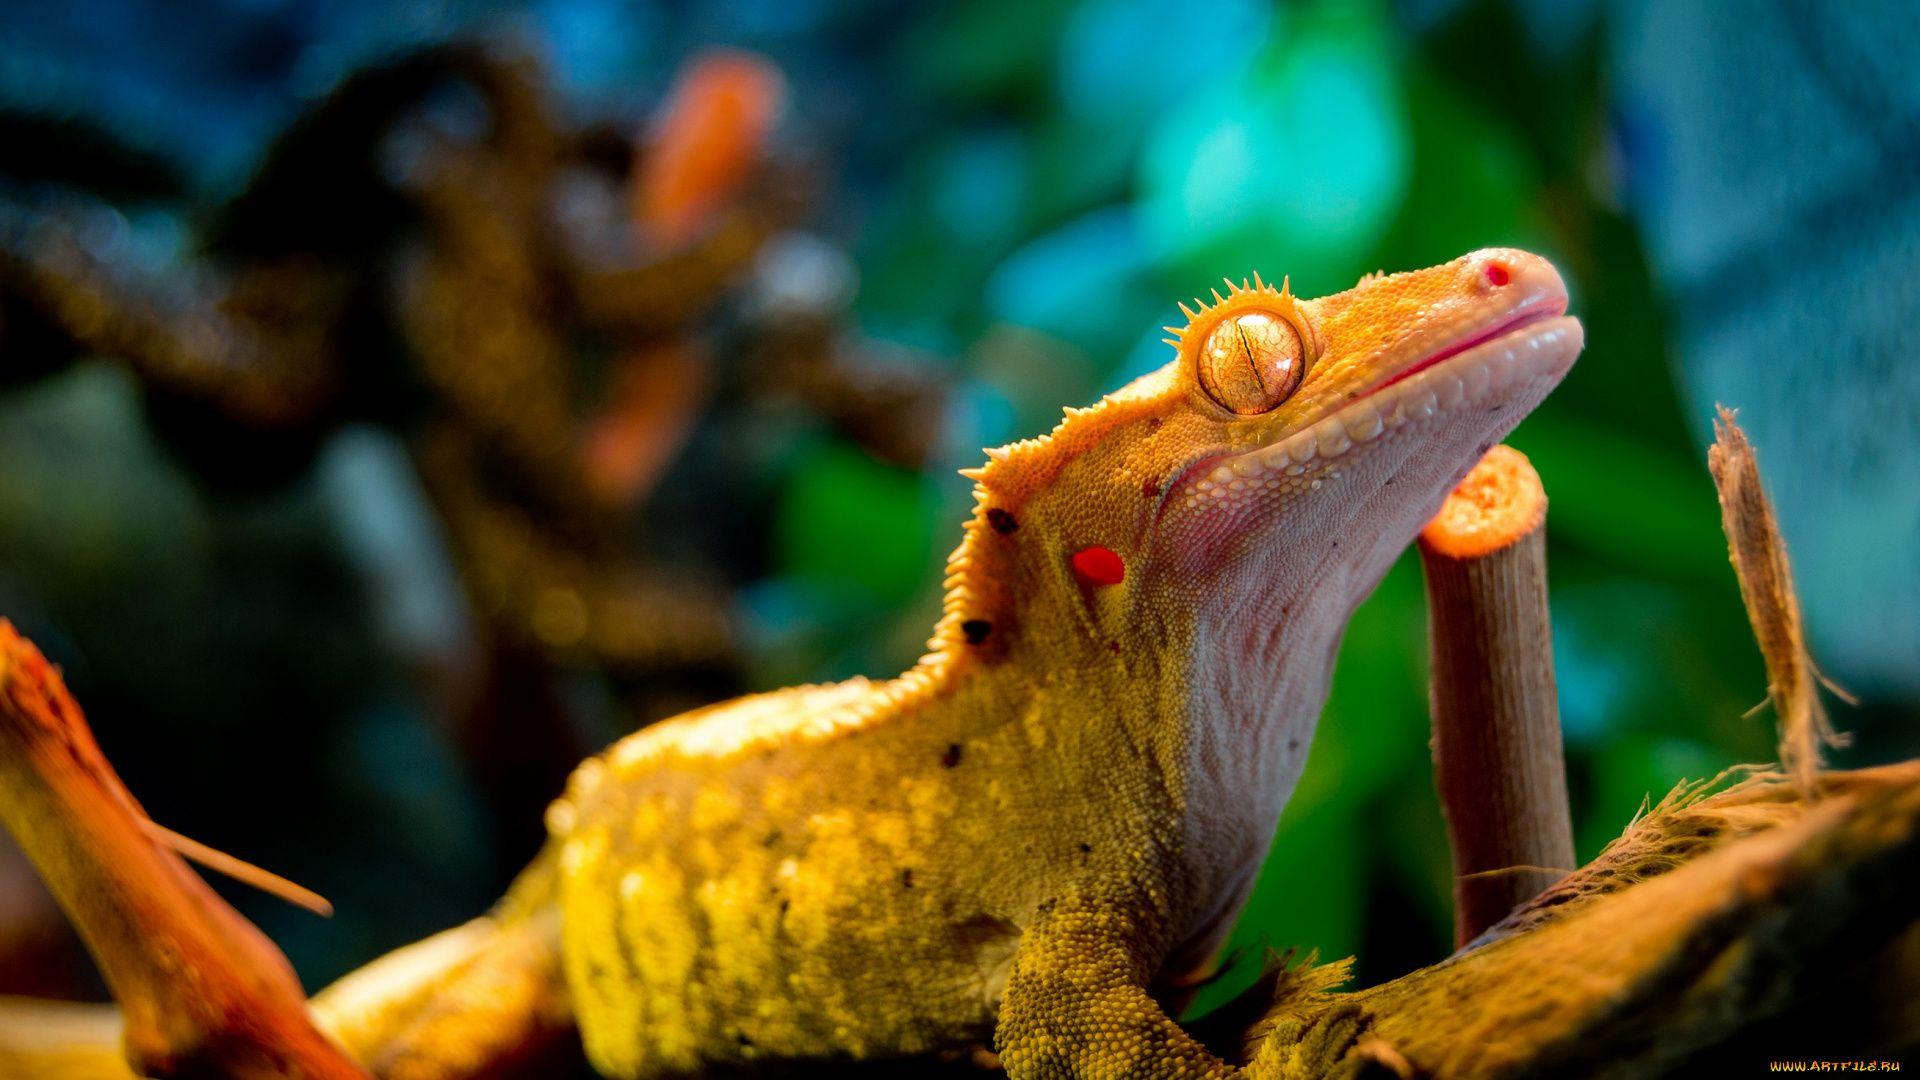 Lizard Banned Photos